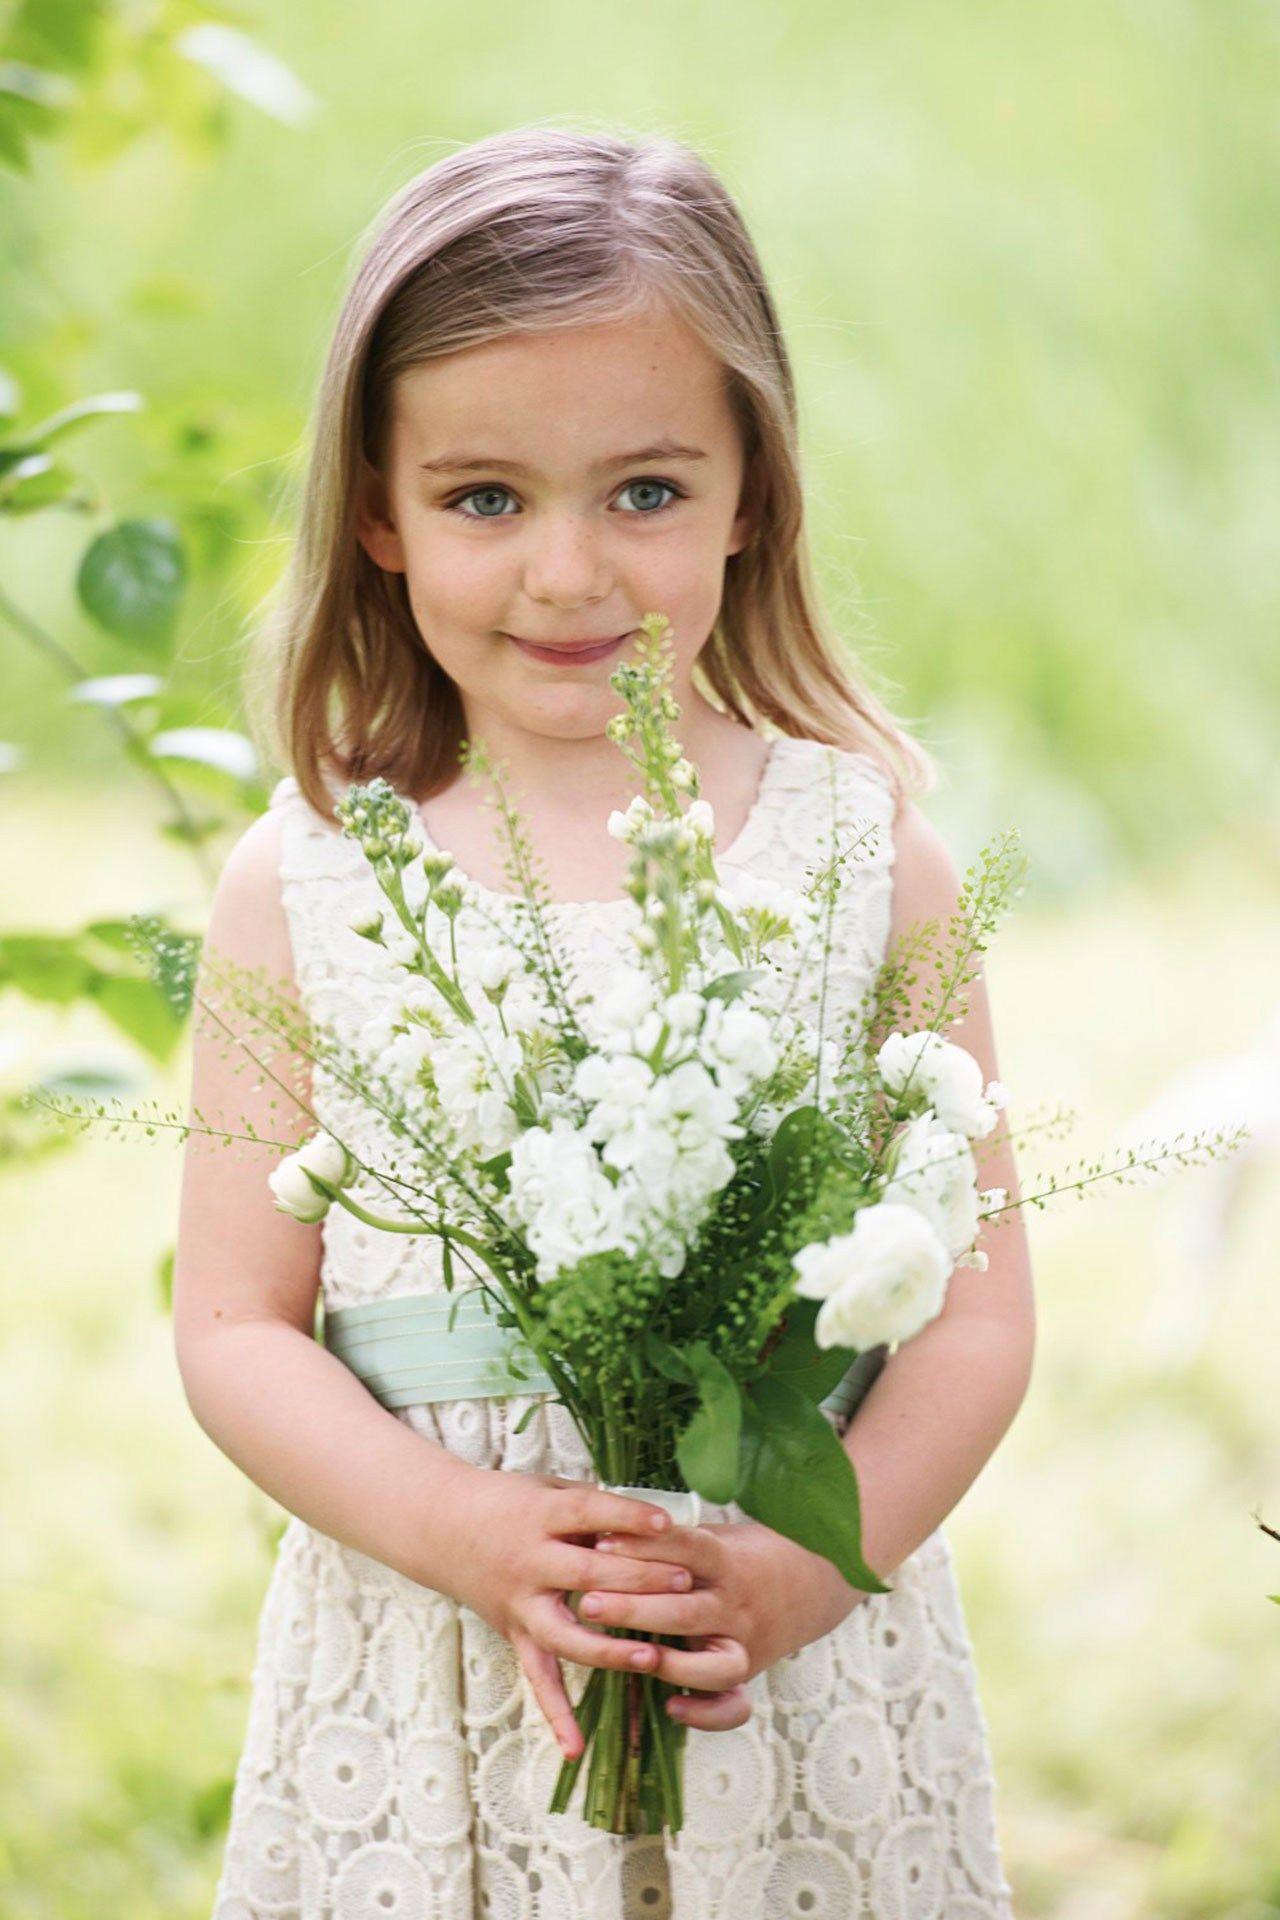 Wedding Bouquet Ideas (BridesMagazine.co.uk) | Flower girl bouquet ...